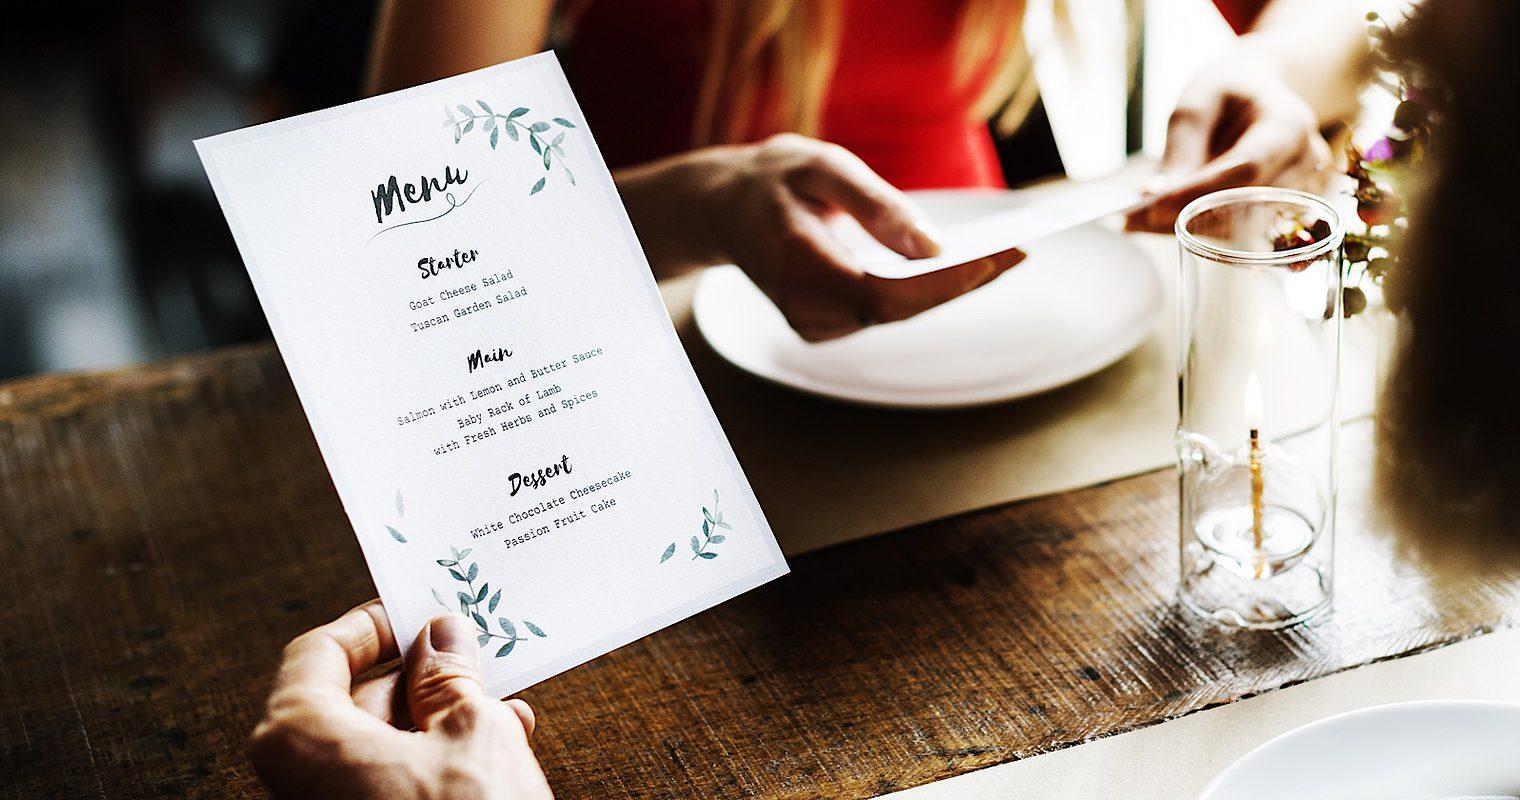 Google My Business Lets Restaurants Add Menus to Listings